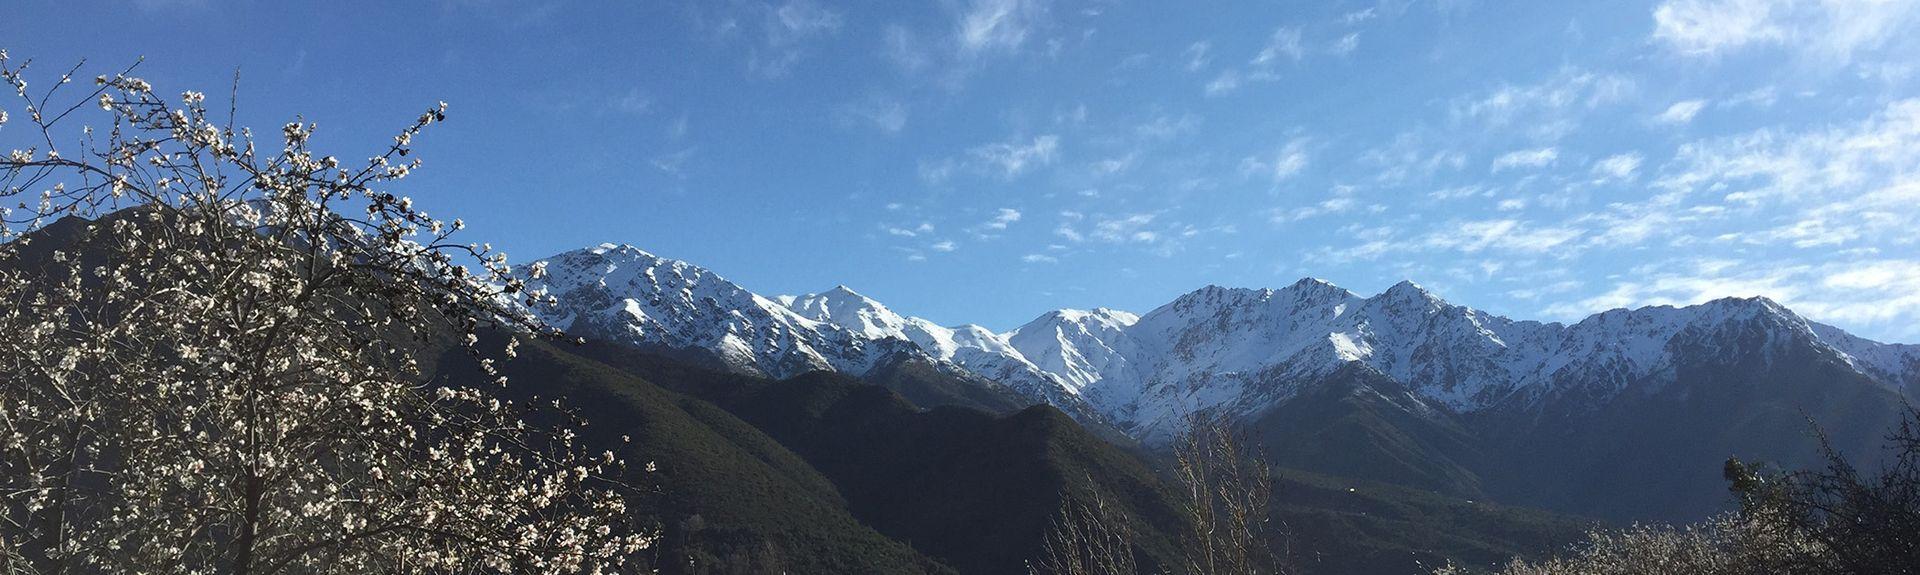 Pirque, Santiago Metropolitan Region, Chile